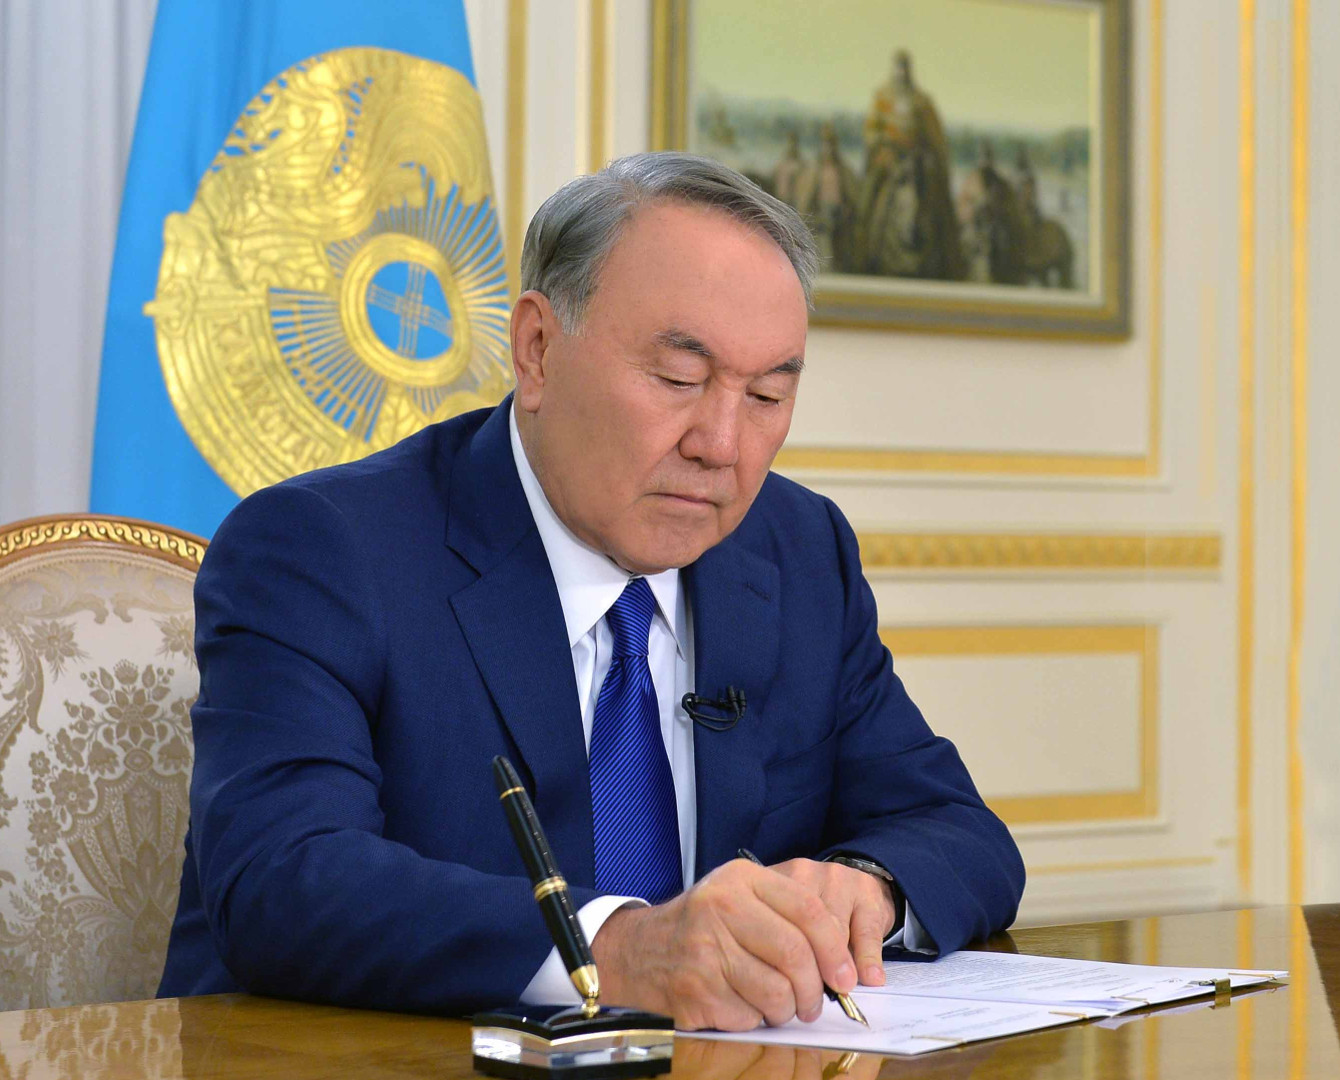 Head of State approves Kazakhstan's Strategic Development Plan until 2025